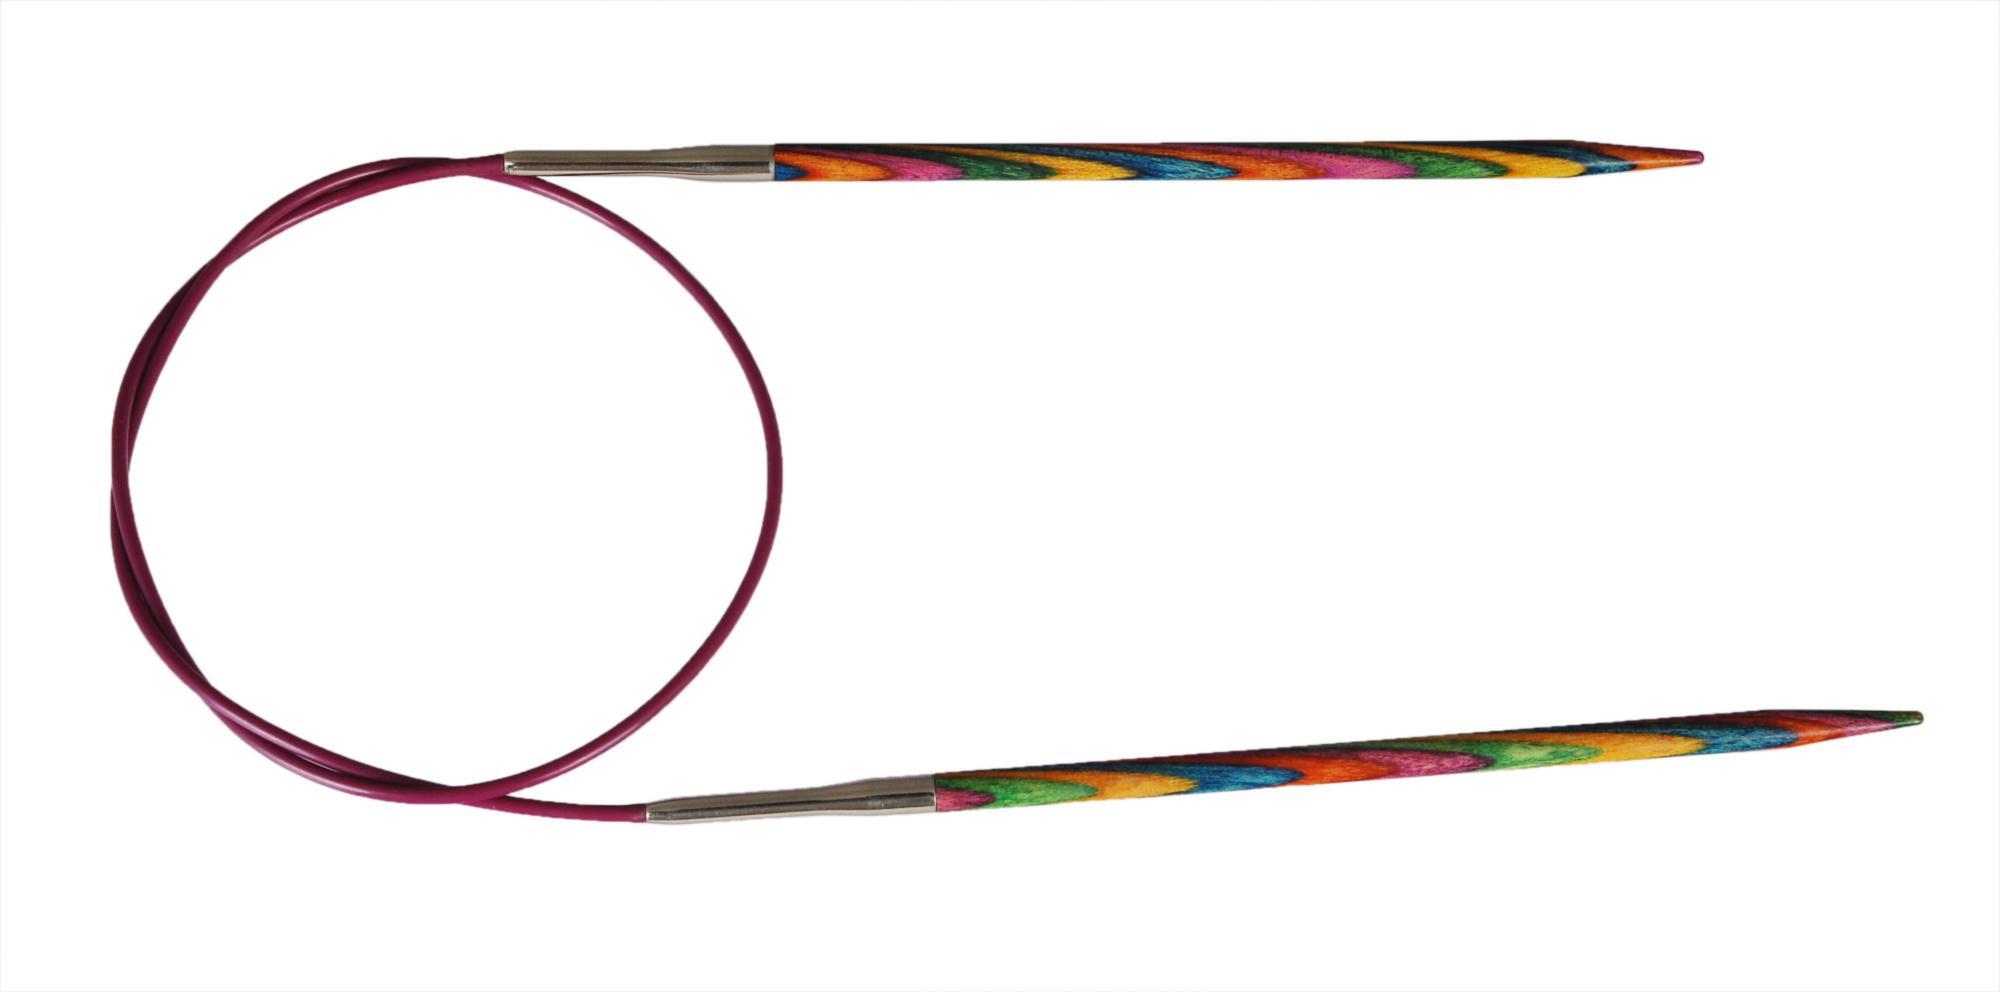 Спицы круговые 100 см Symfonie Wood KnitPro, 21352, 4.00 мм